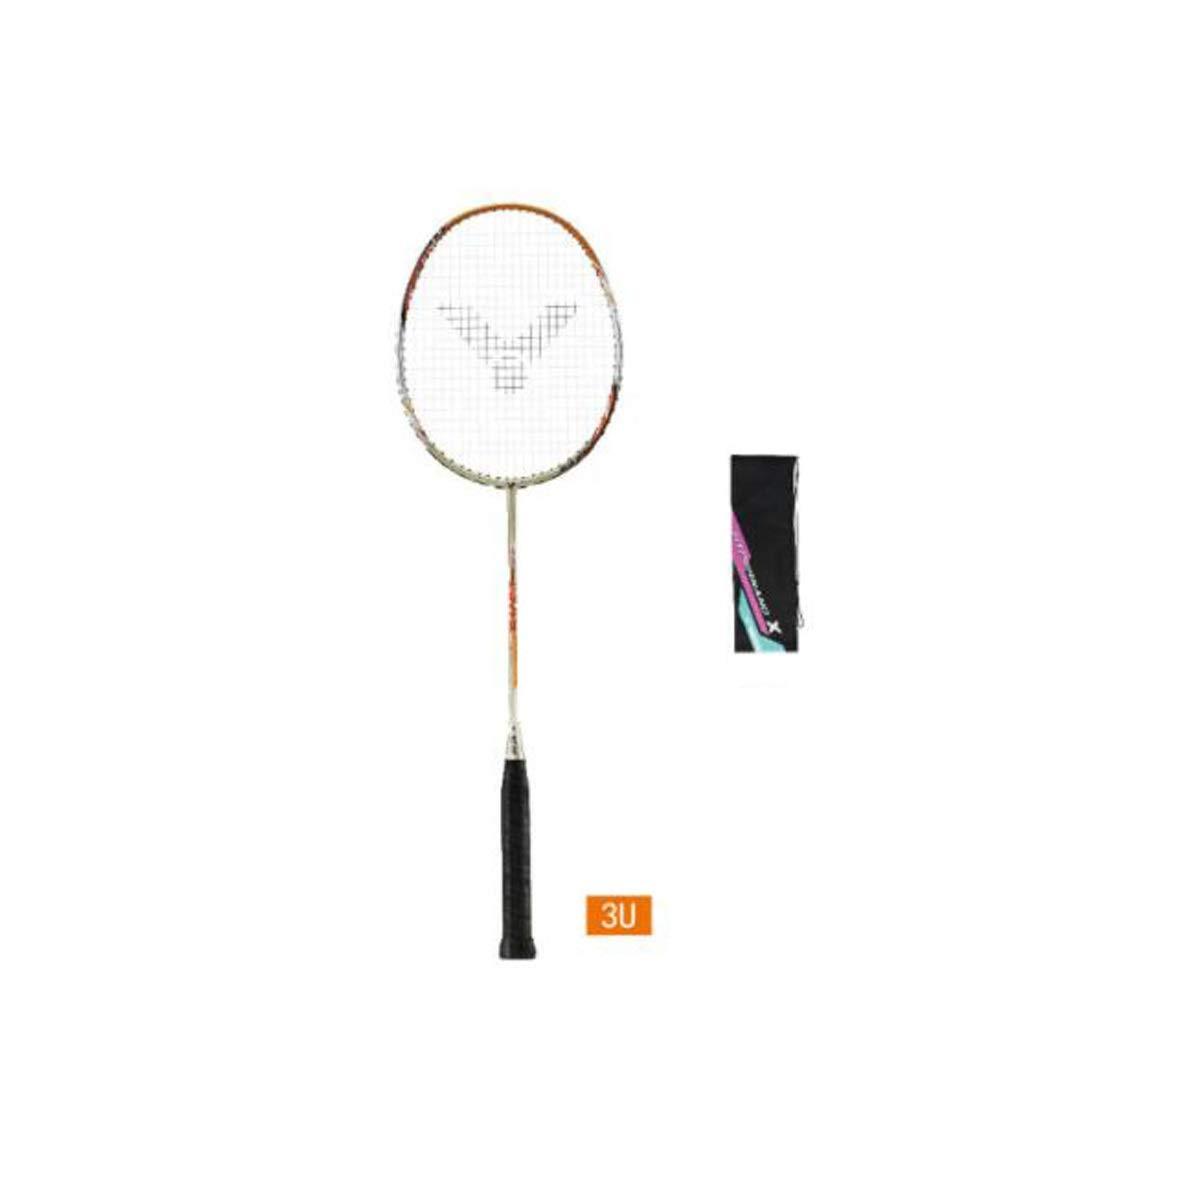 Tongboshi Badminton Racket, Training Grade, Full Carbon Fiber Badminton Racket, Champagne Gold, Amber Gold Badminton Racket, (Color : Champagne Gold, Material : 3U)